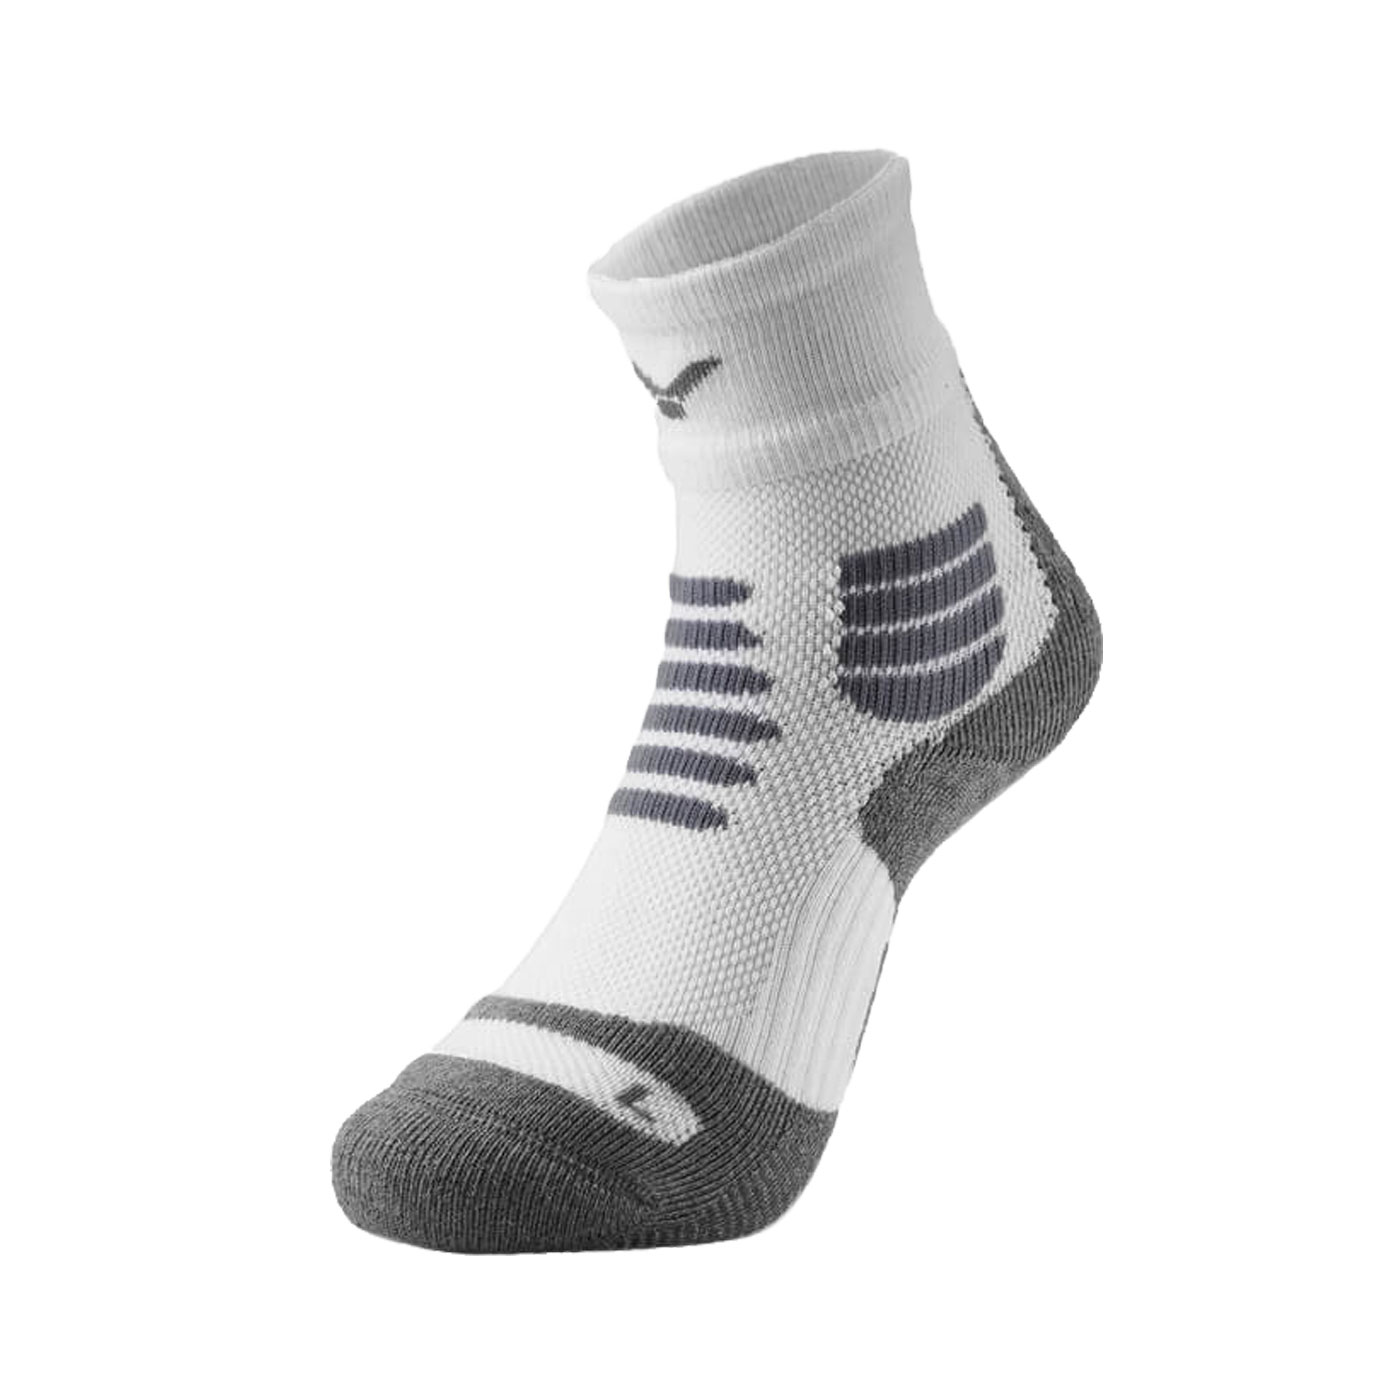 VICTOR 專業羽球襪 C-5054A